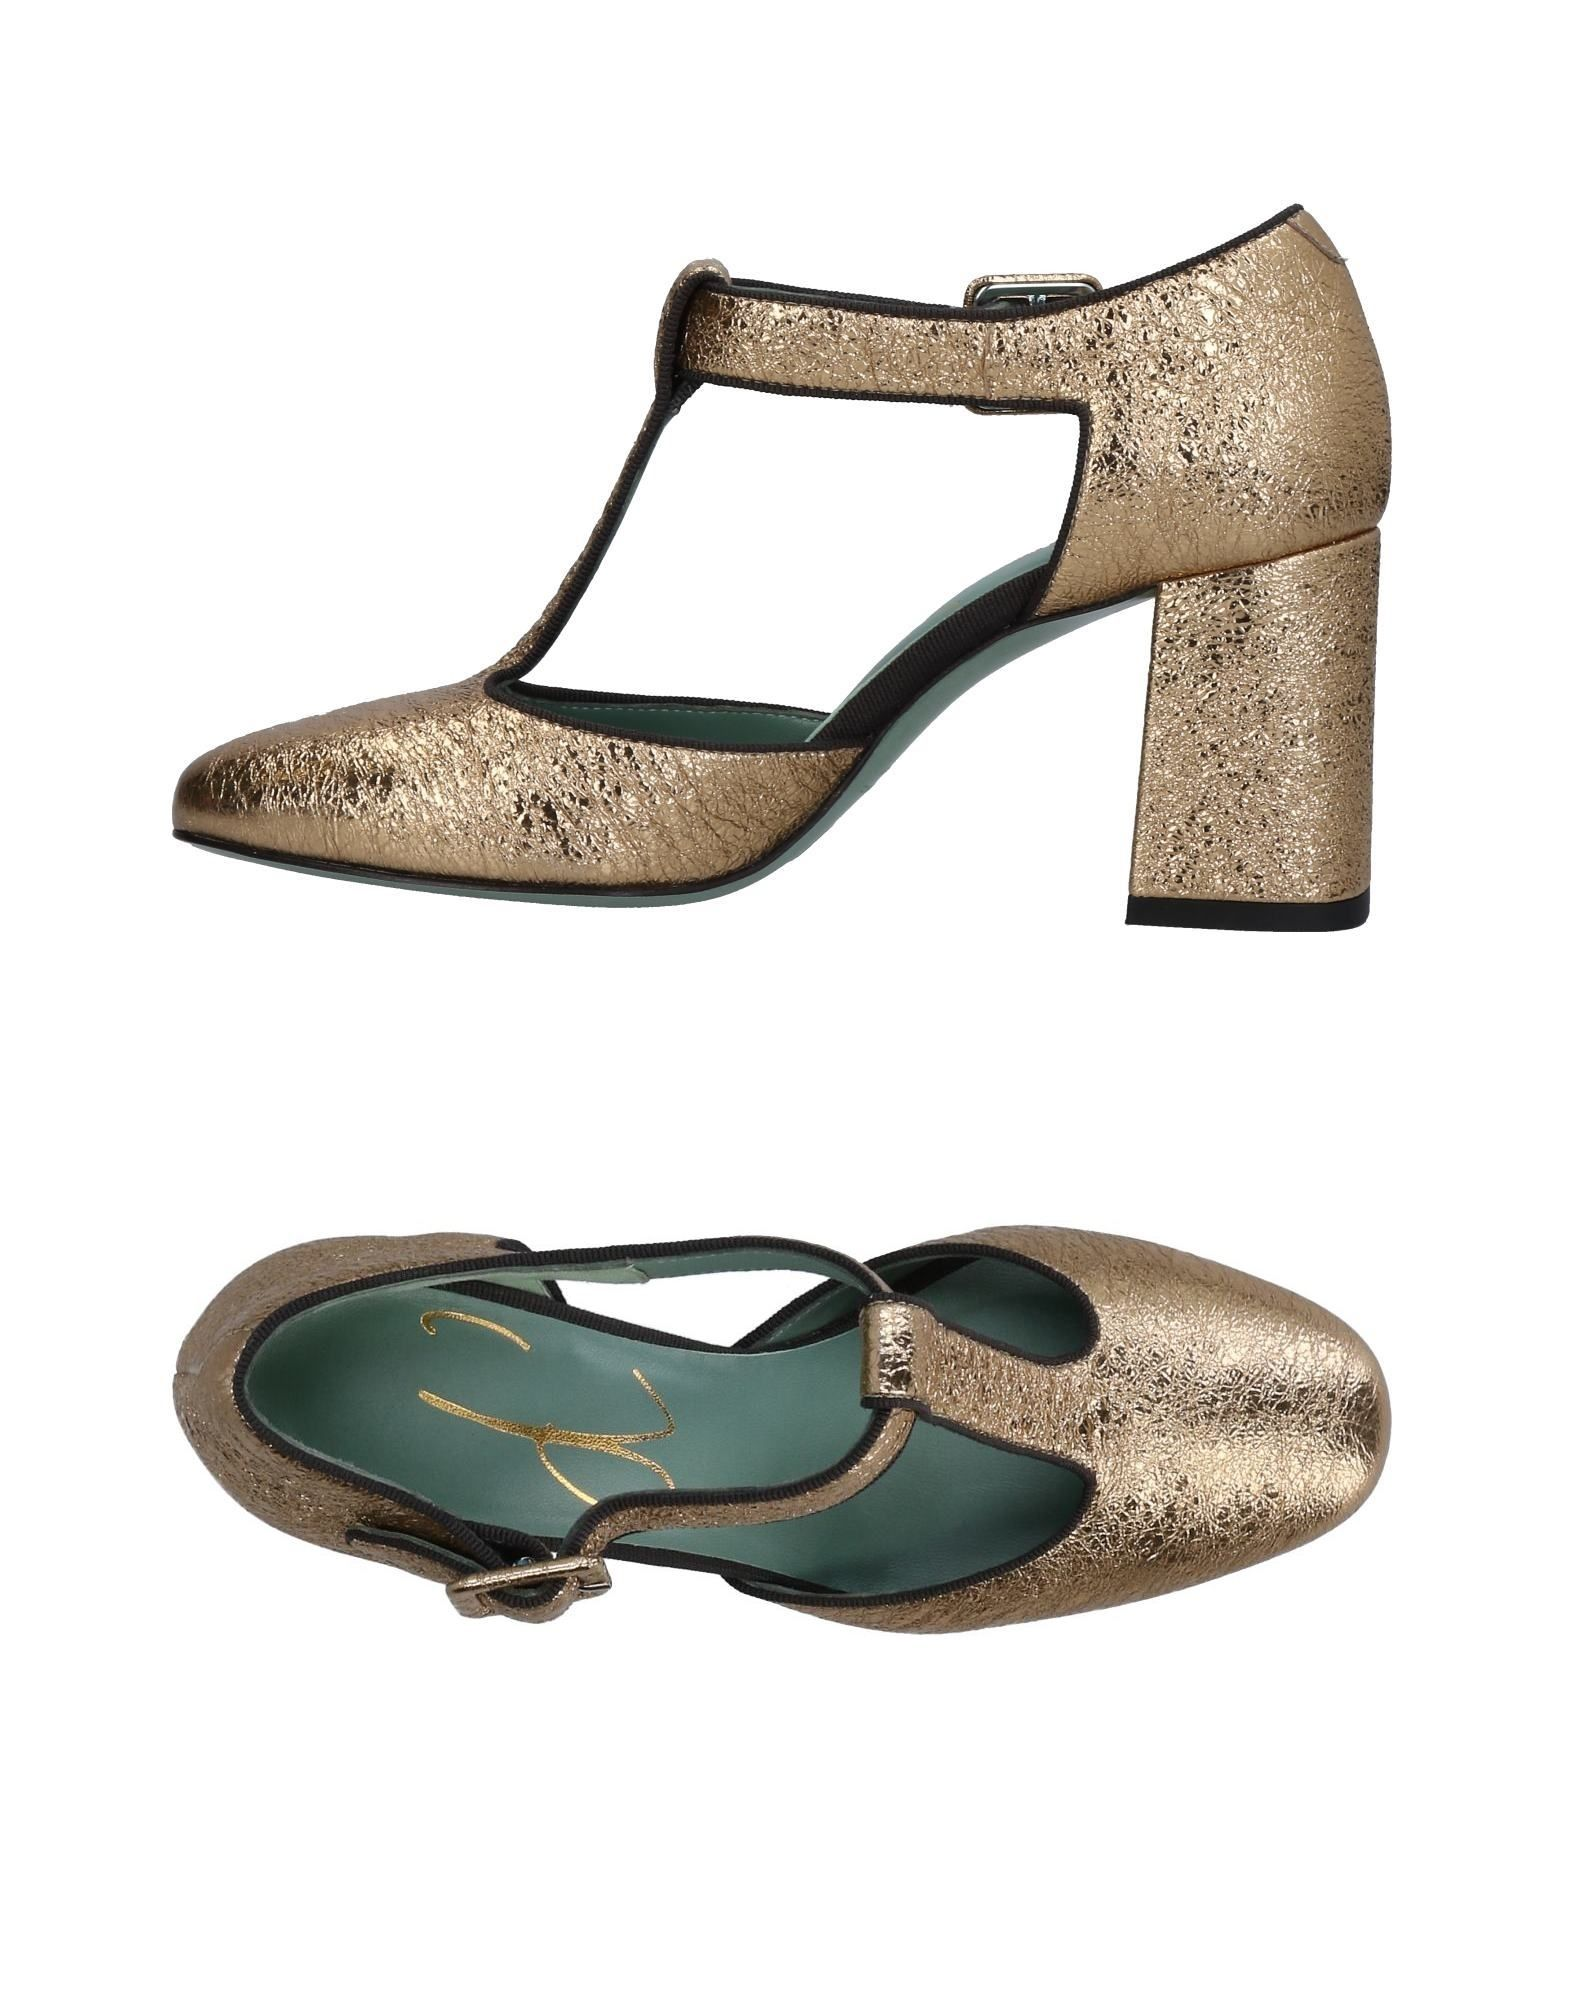 Paola 11459897ITGut D'arcano Pumps Damen  11459897ITGut Paola aussehende strapazierfähige Schuhe 821b7c